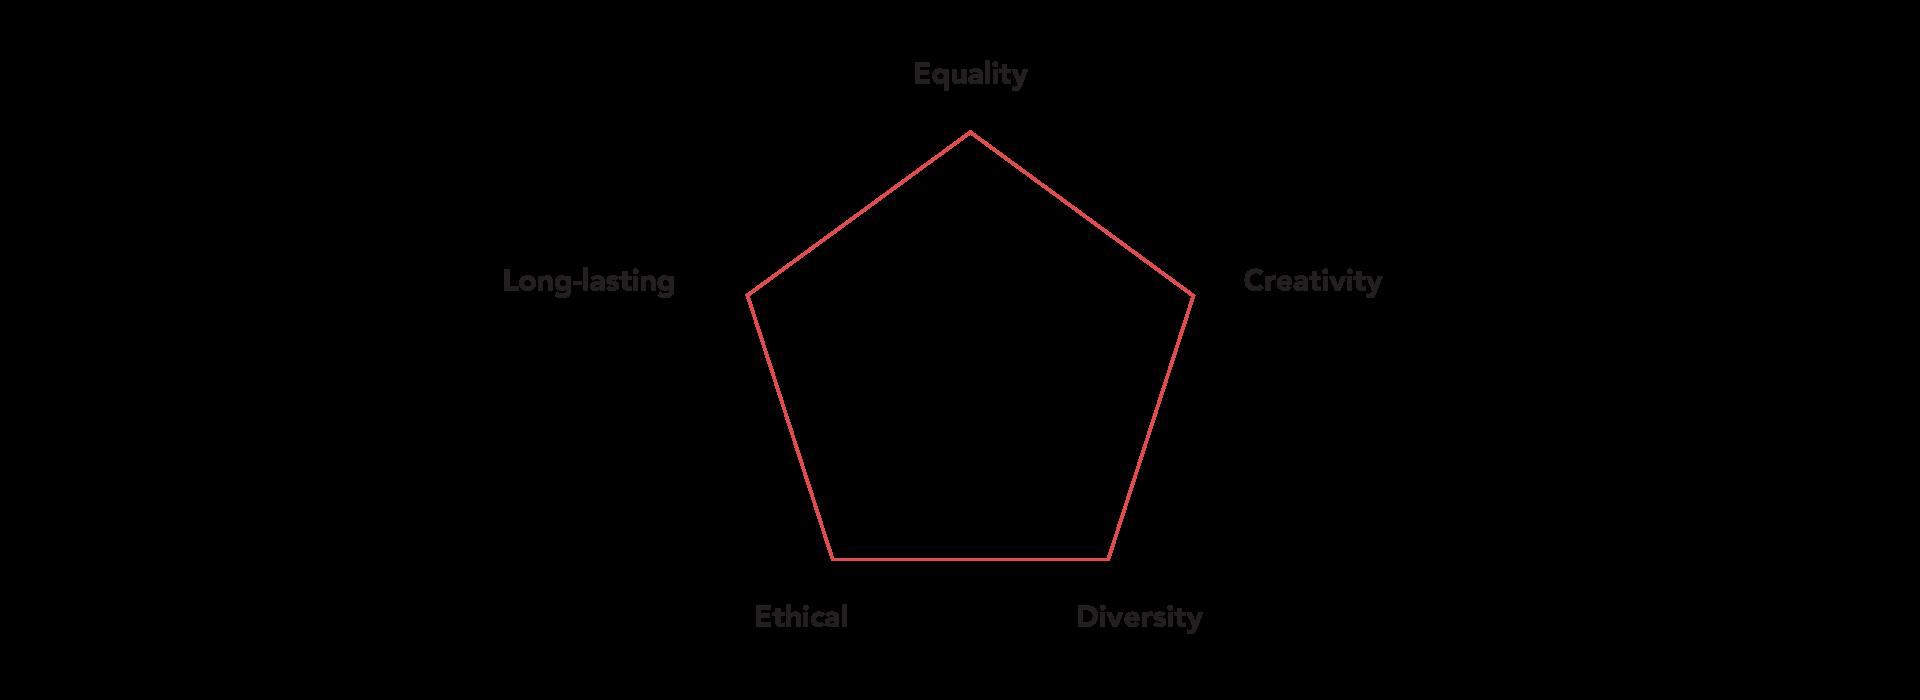 attributes.png